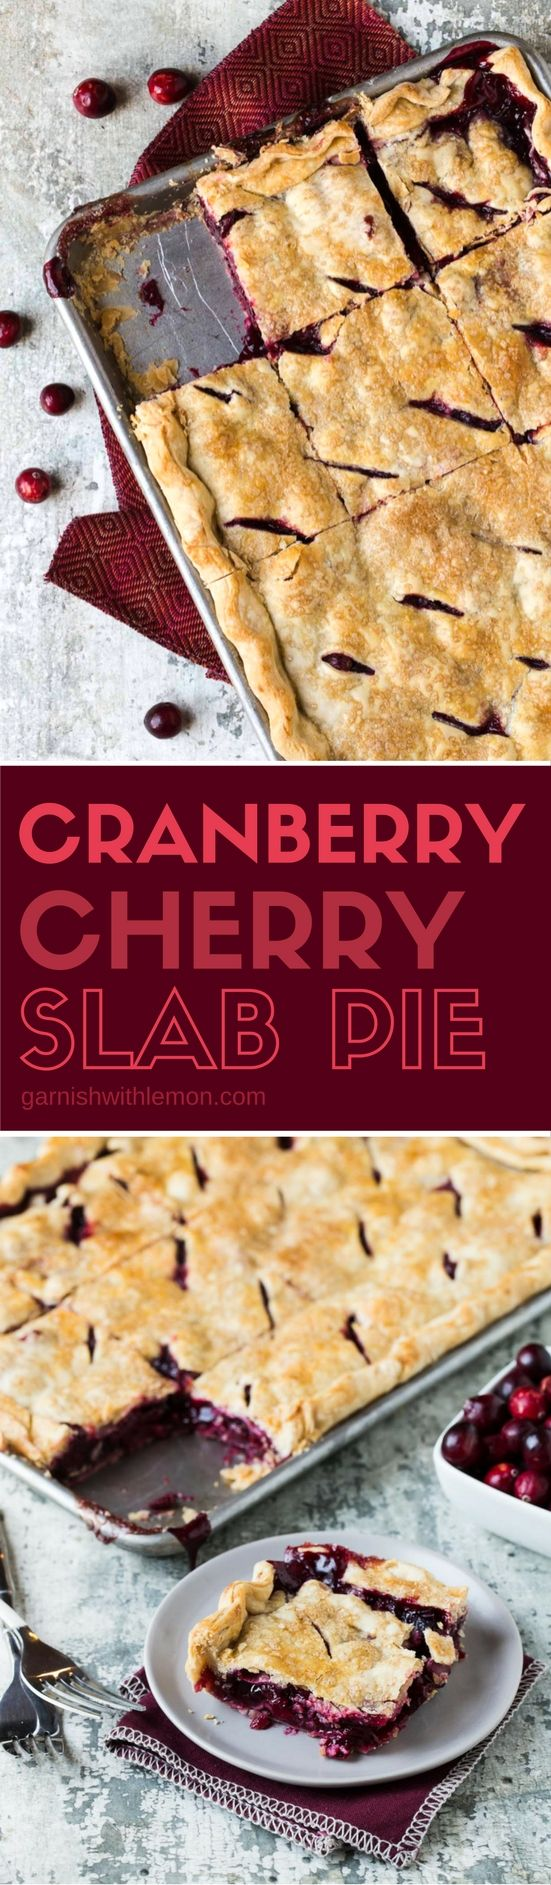 Cranberry Cherry Slab Pie - Garnish with Lemon